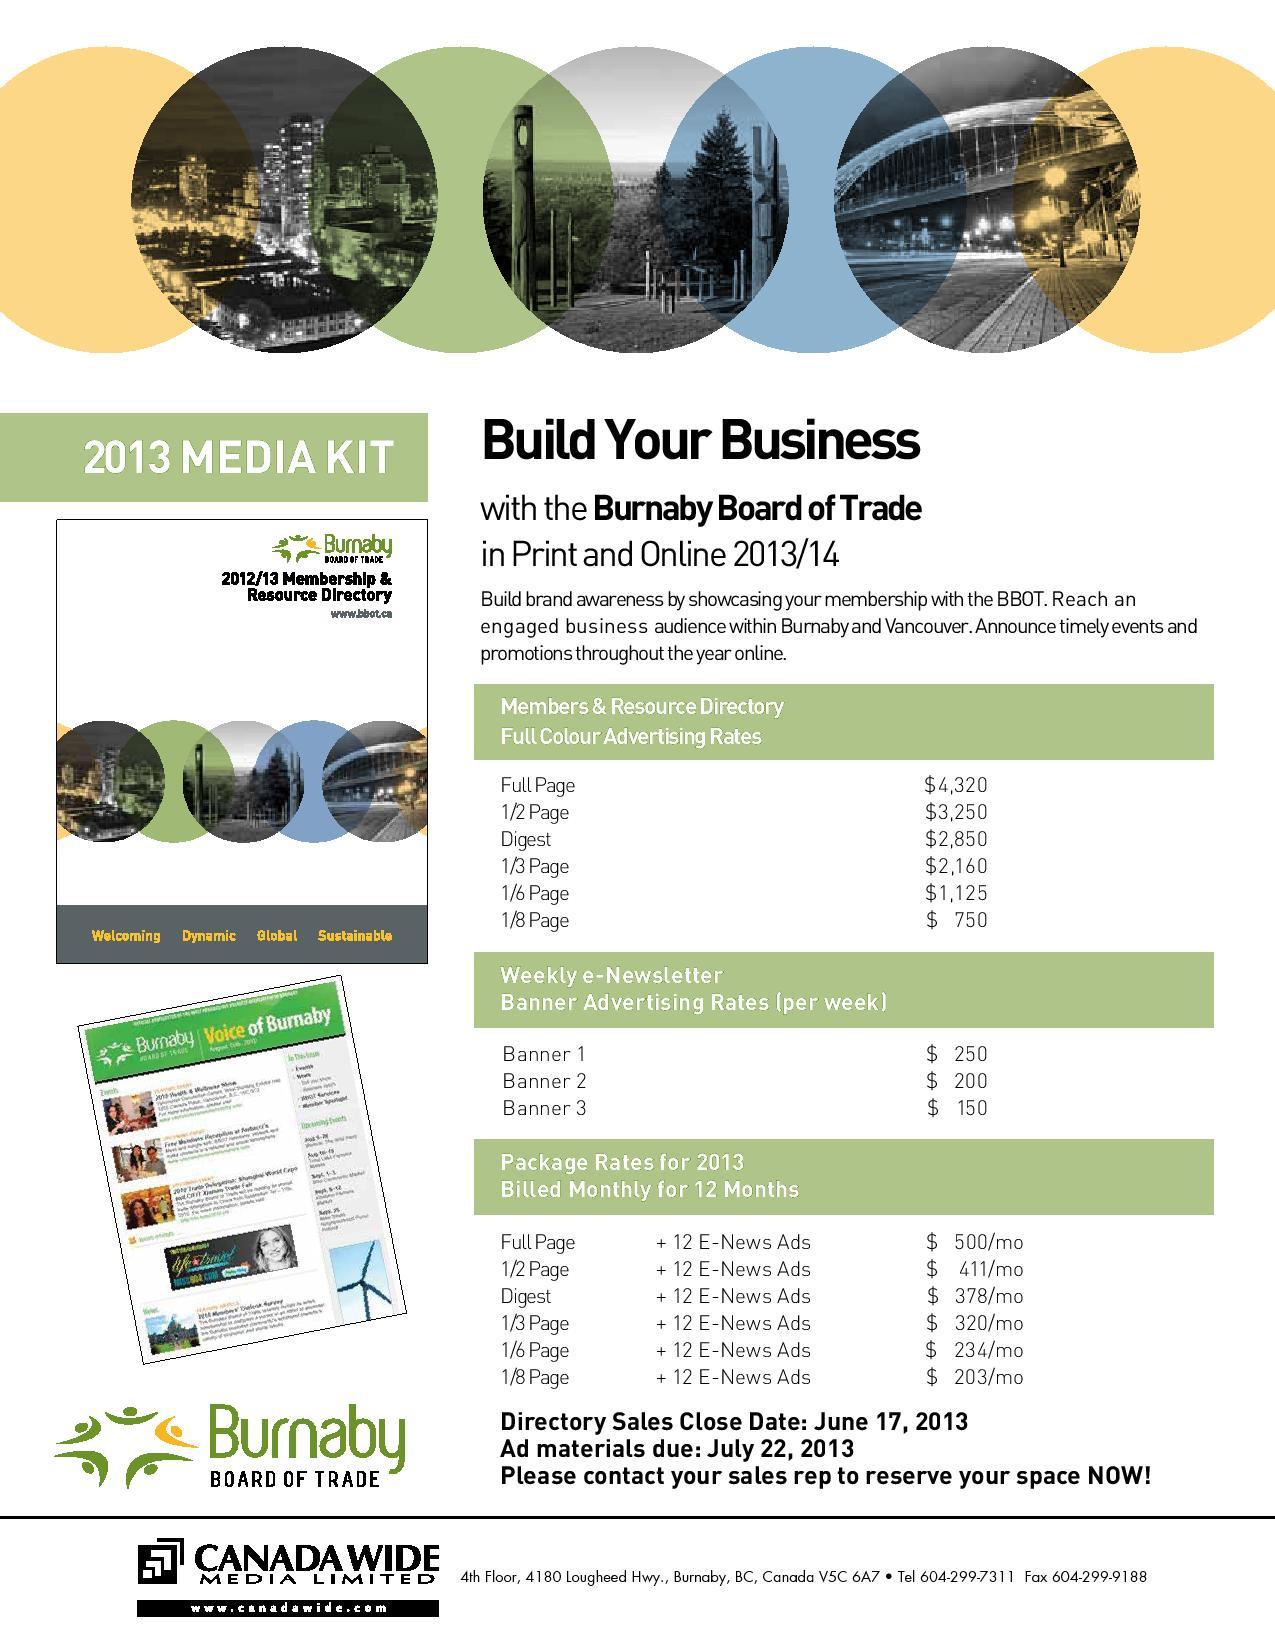 BBOT 2013/14 Media Kit & Rate Card! - Burnaby Board of Trade